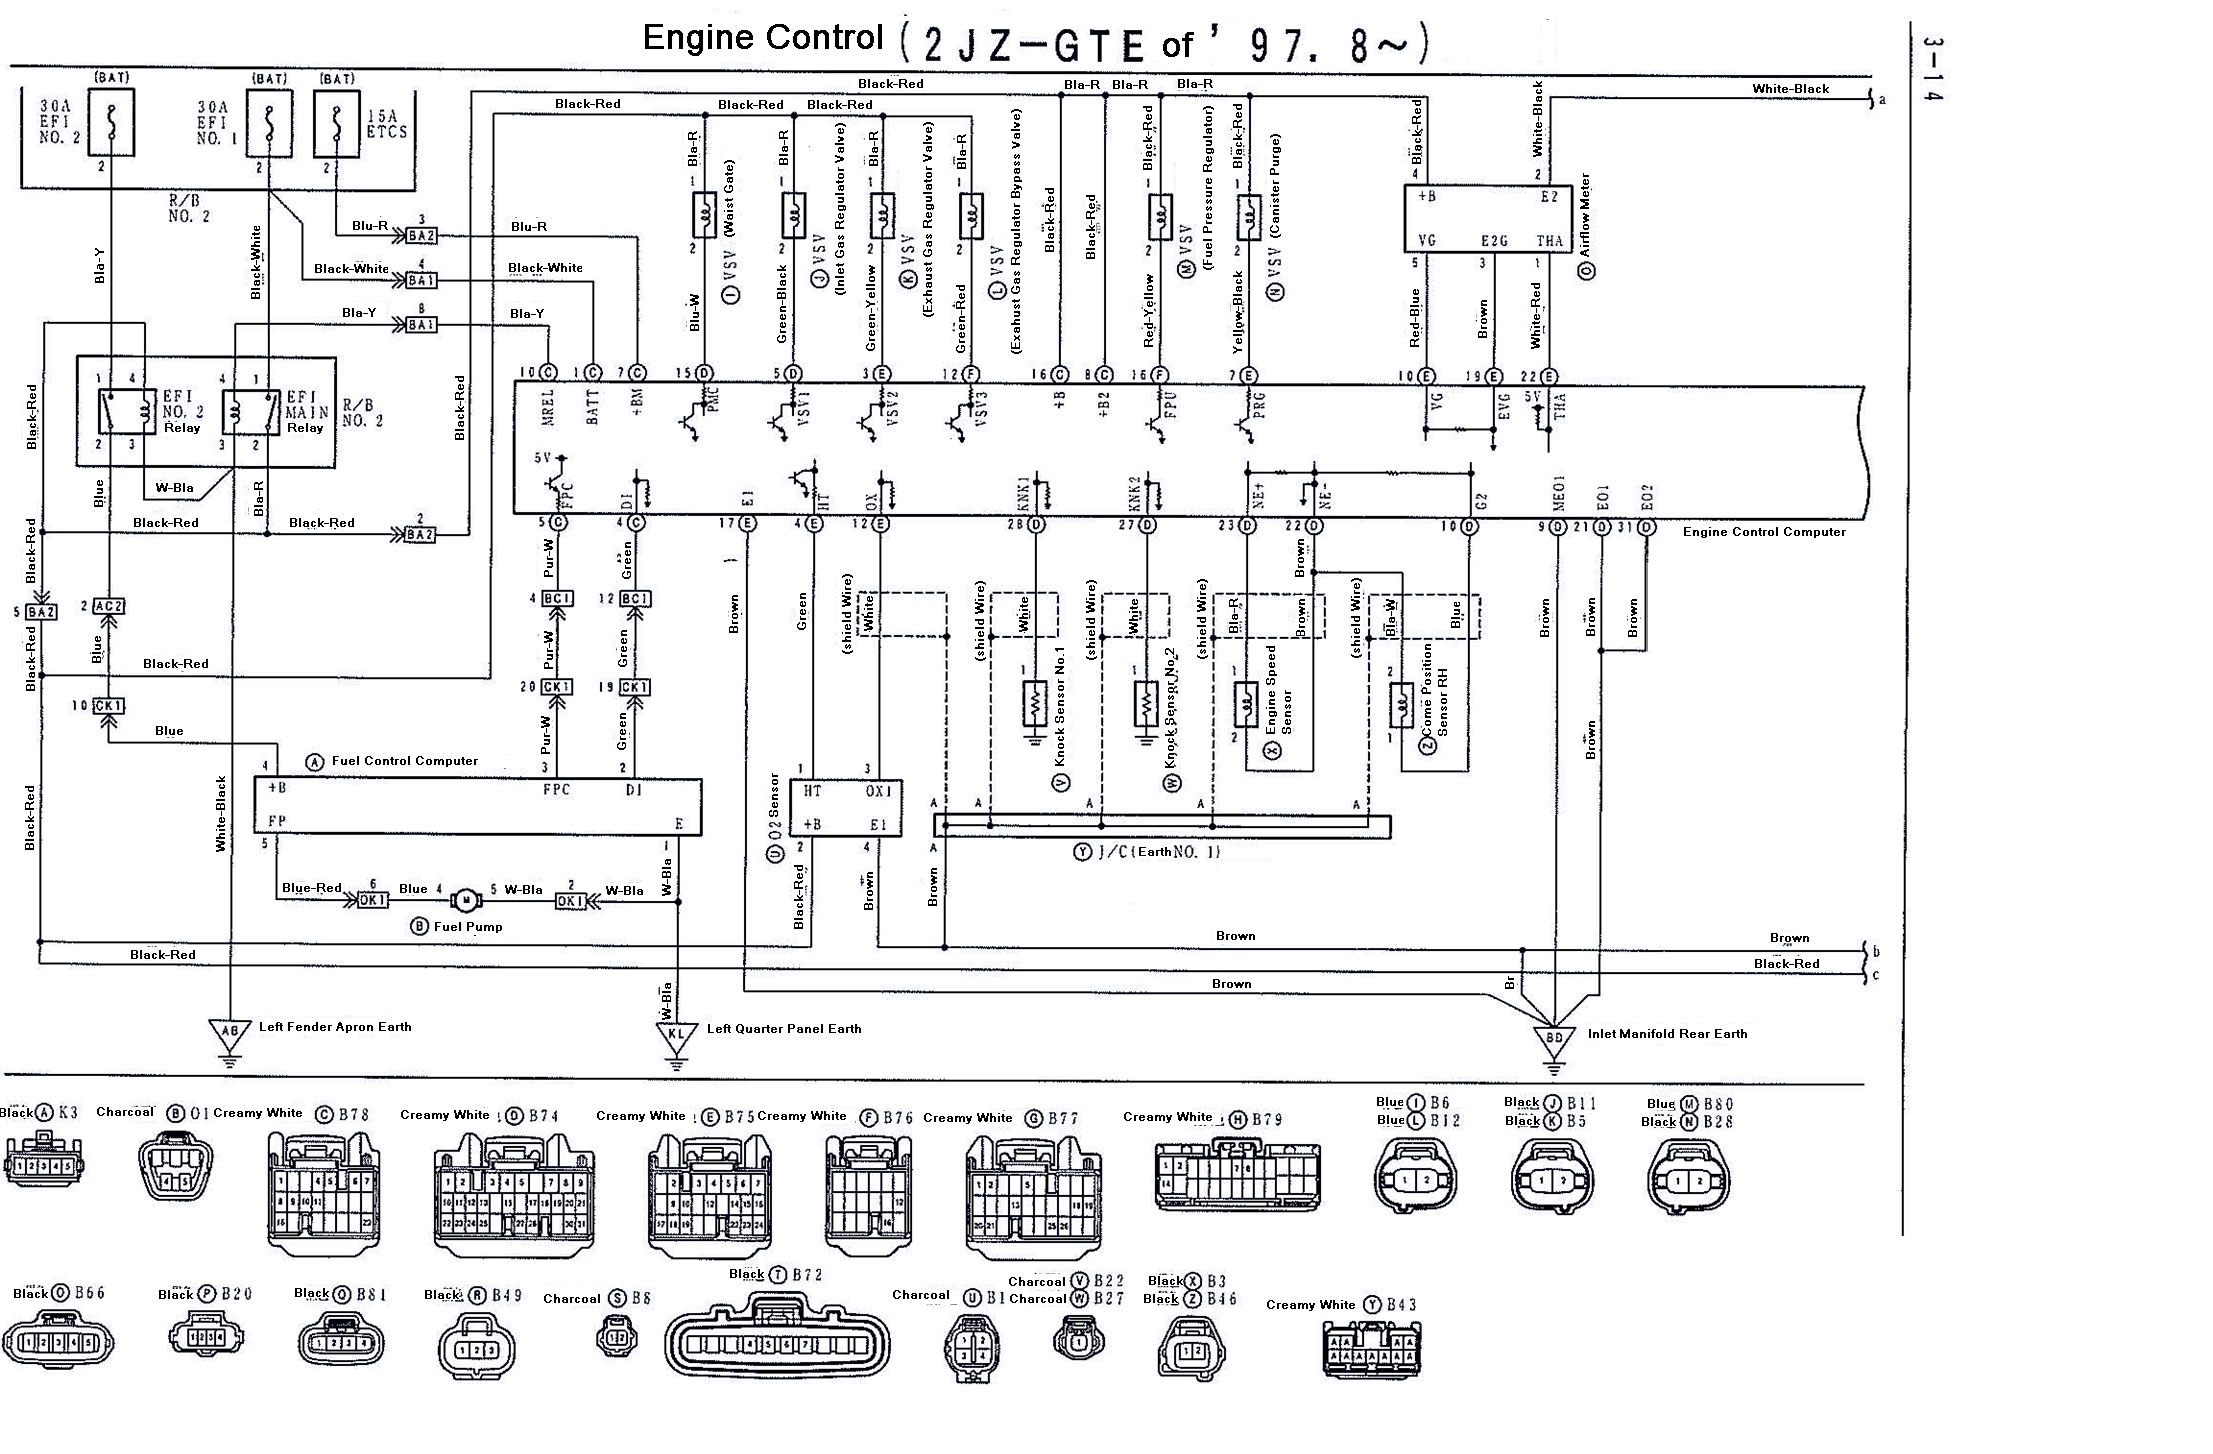 Supra 2jzgte Vvti Wiring Diagrams 97 8 02